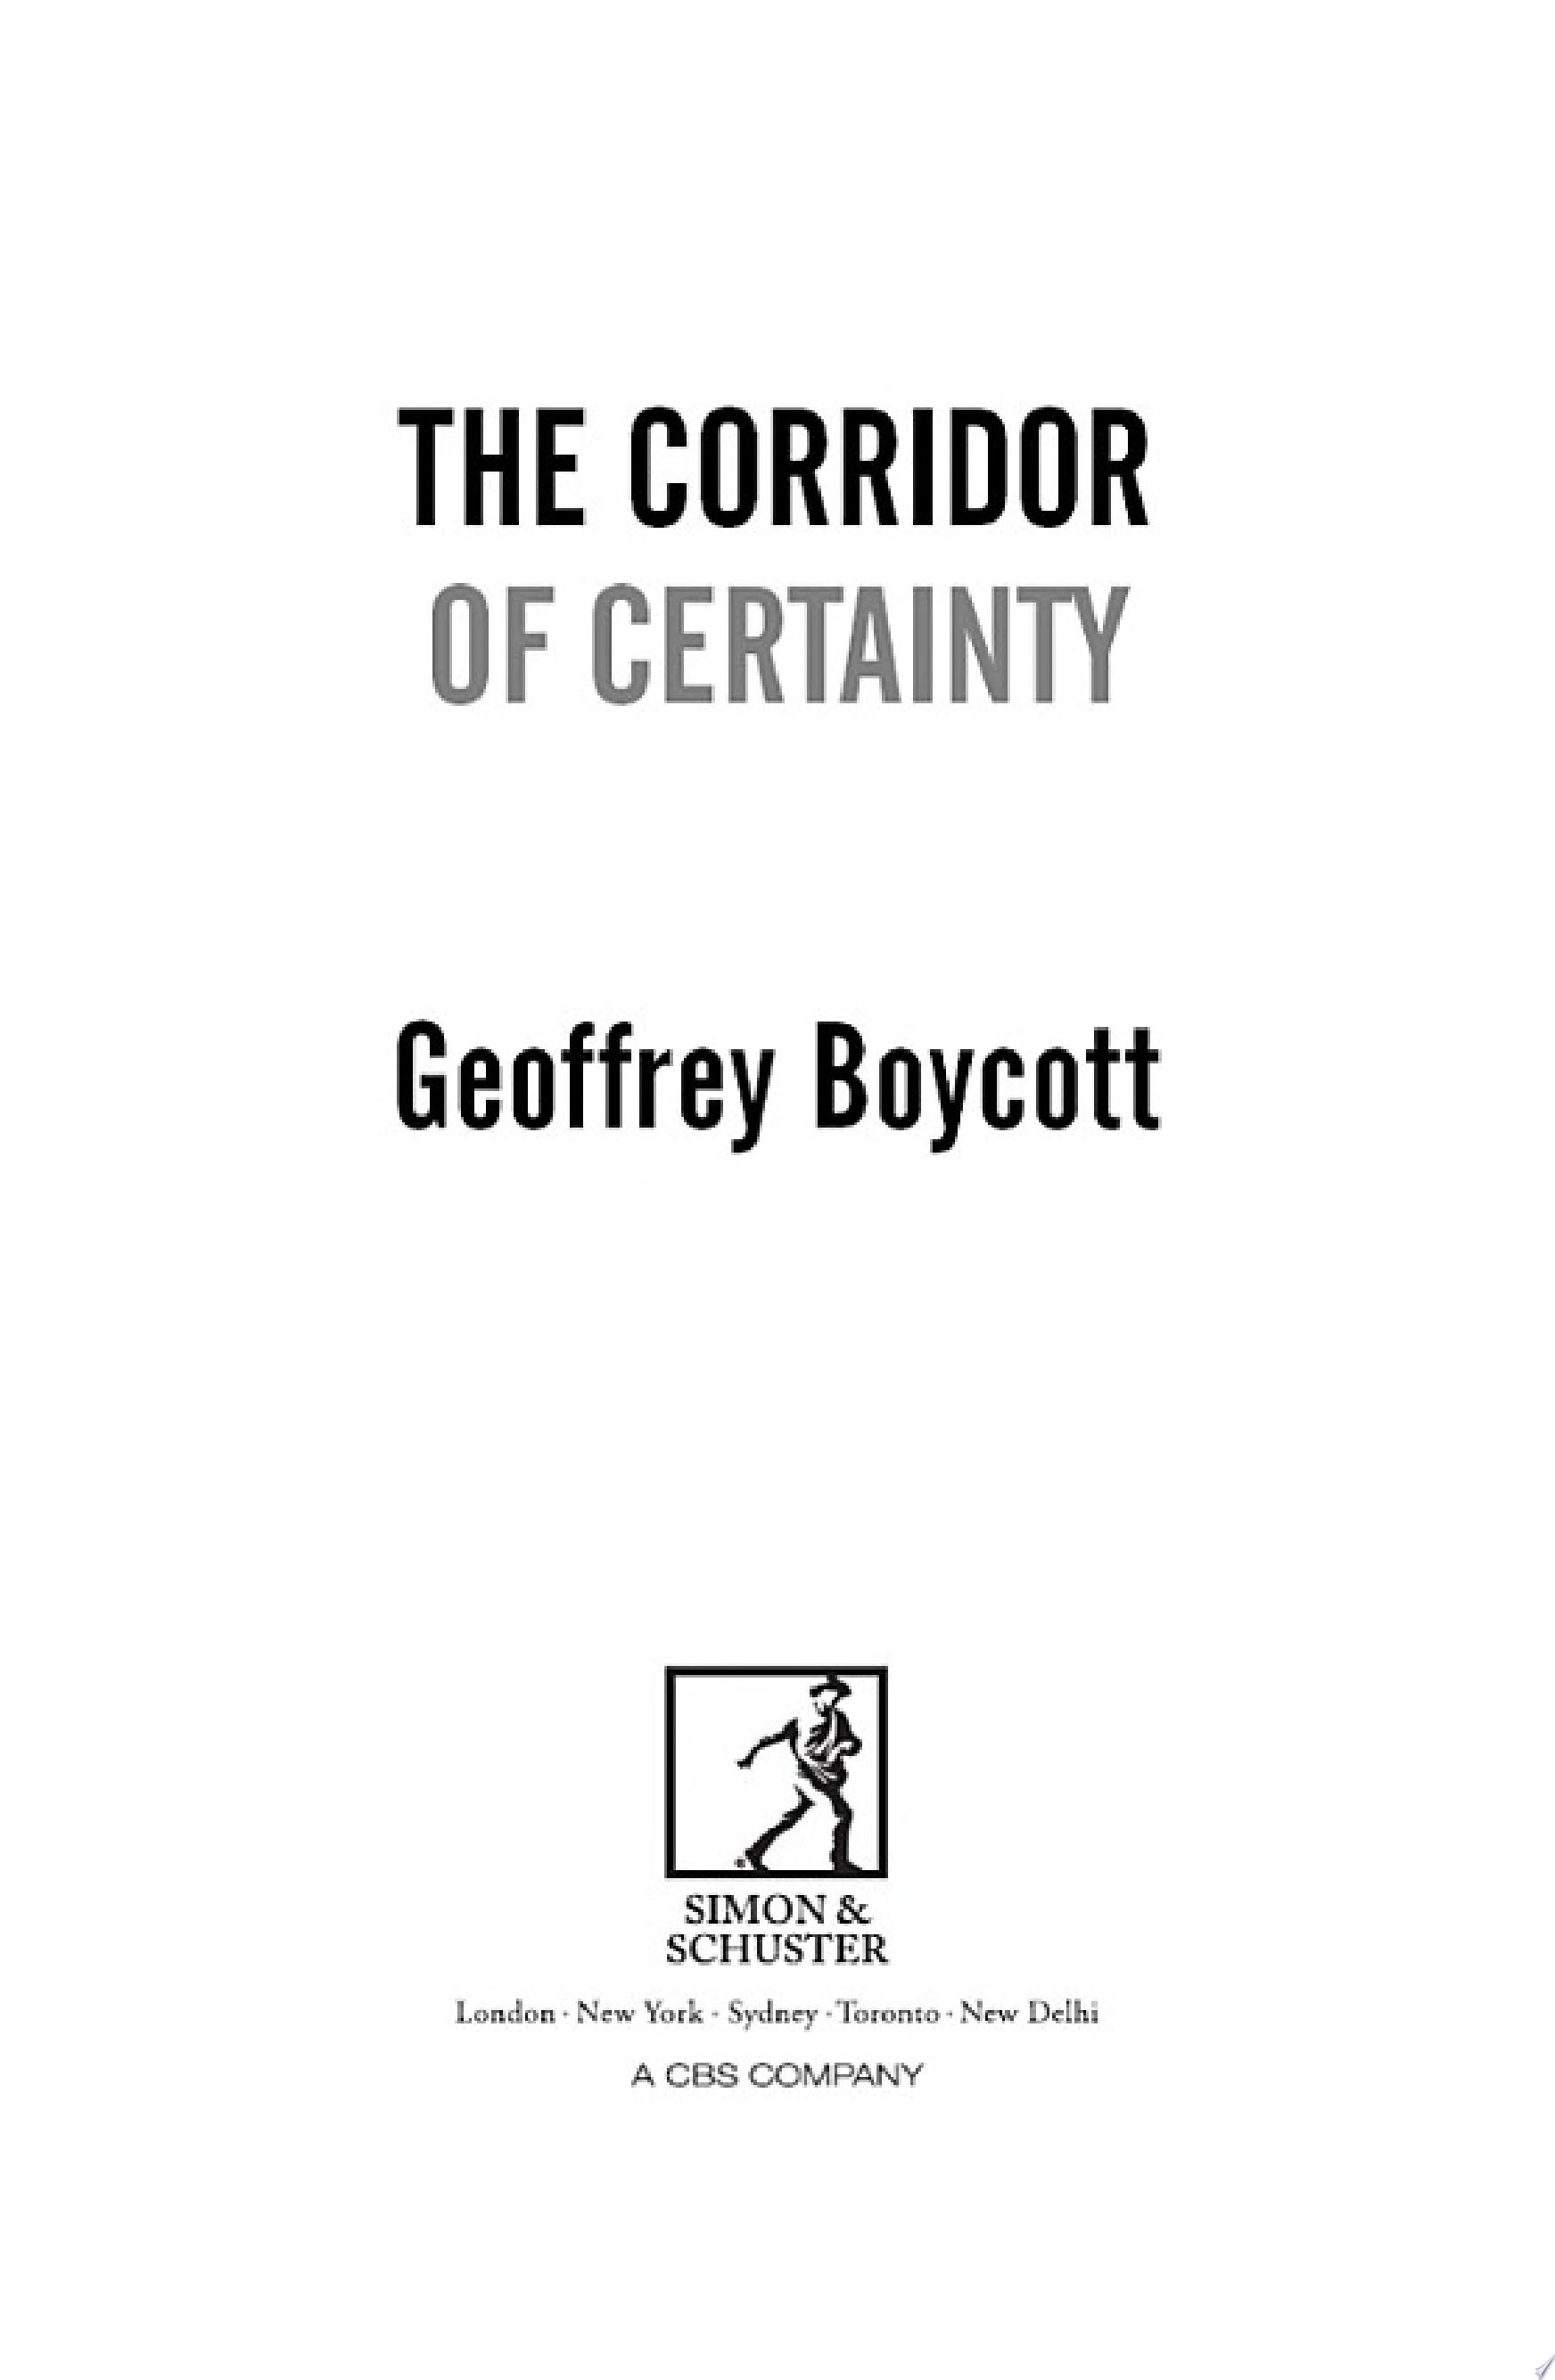 The Corridor of Certainty